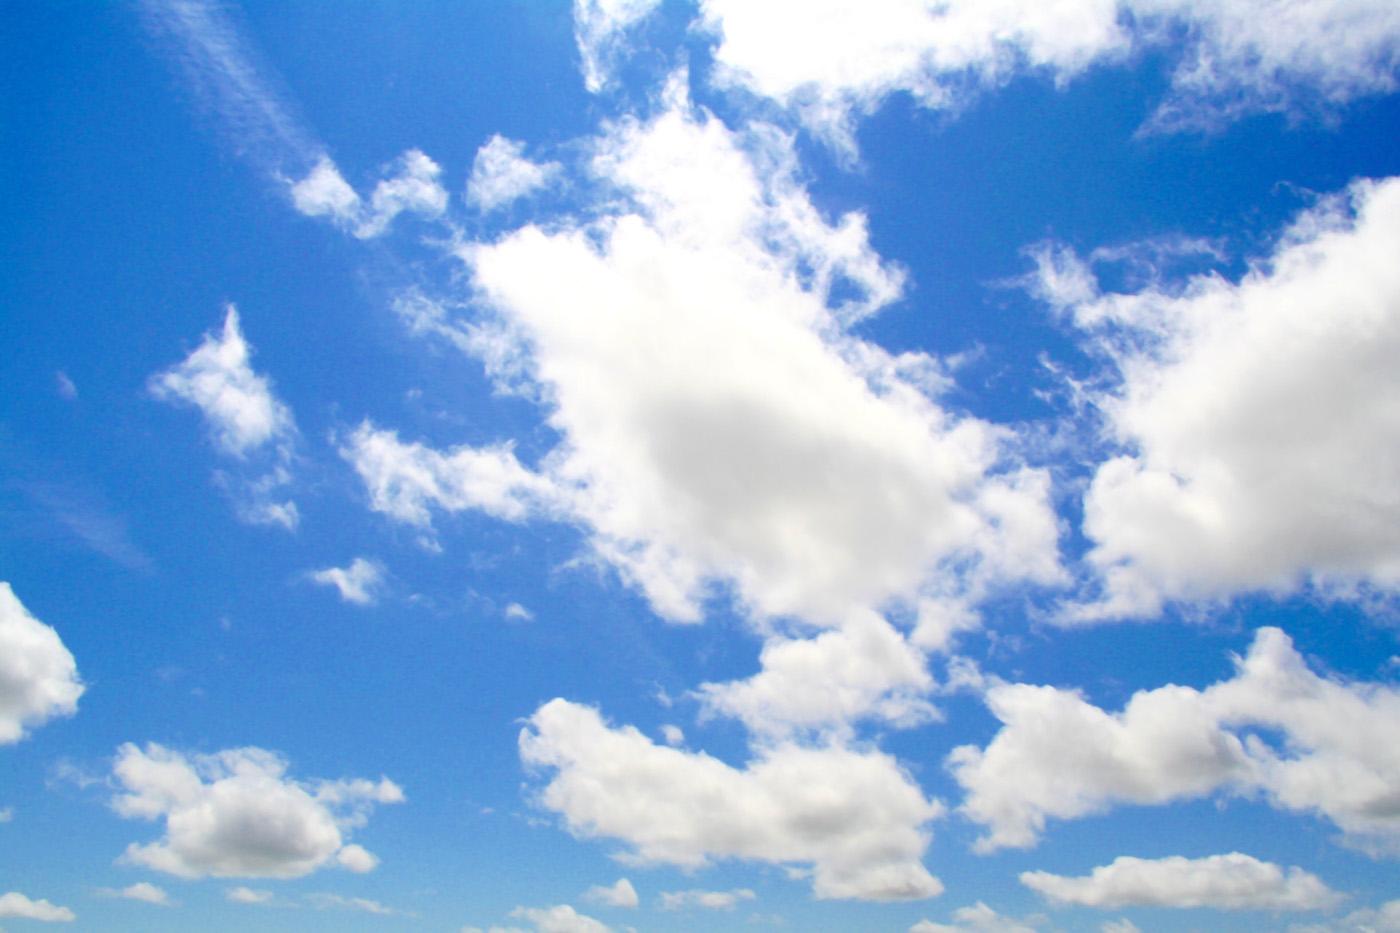 blue-sky-laws